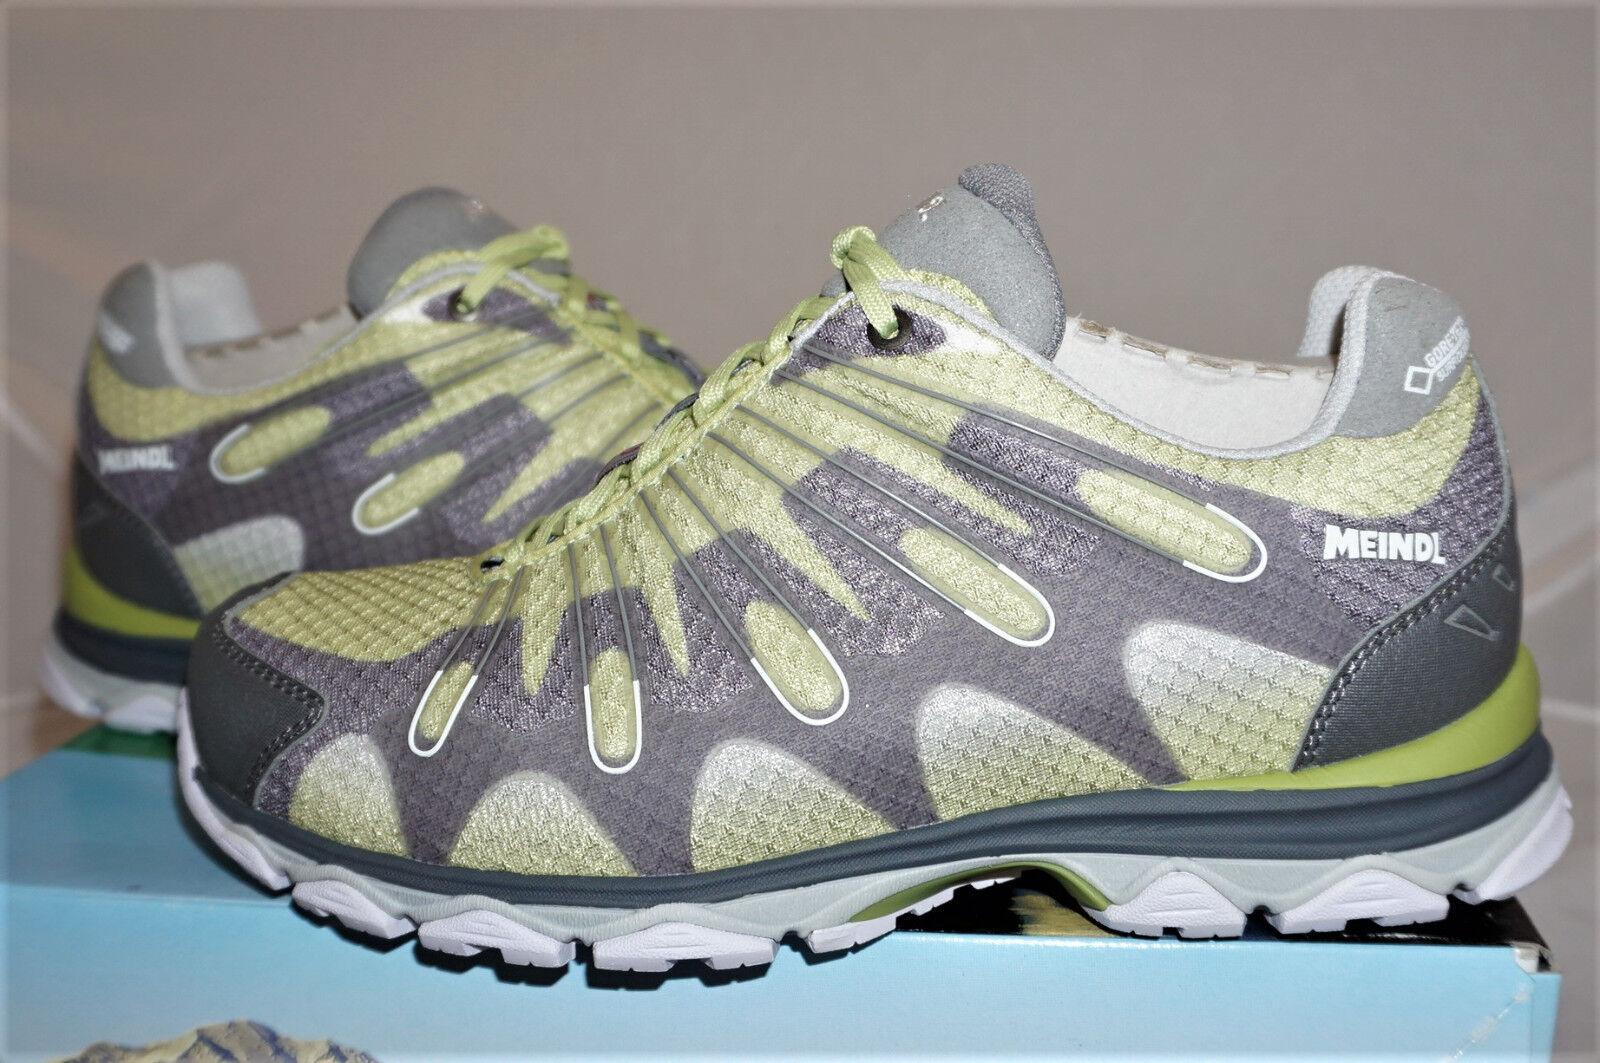 Meindl GTX UK UK UK 4 5 EU 37 5 US 5 5 Wanderschuhe Bergschuhe Schuhe NEU e43d2b